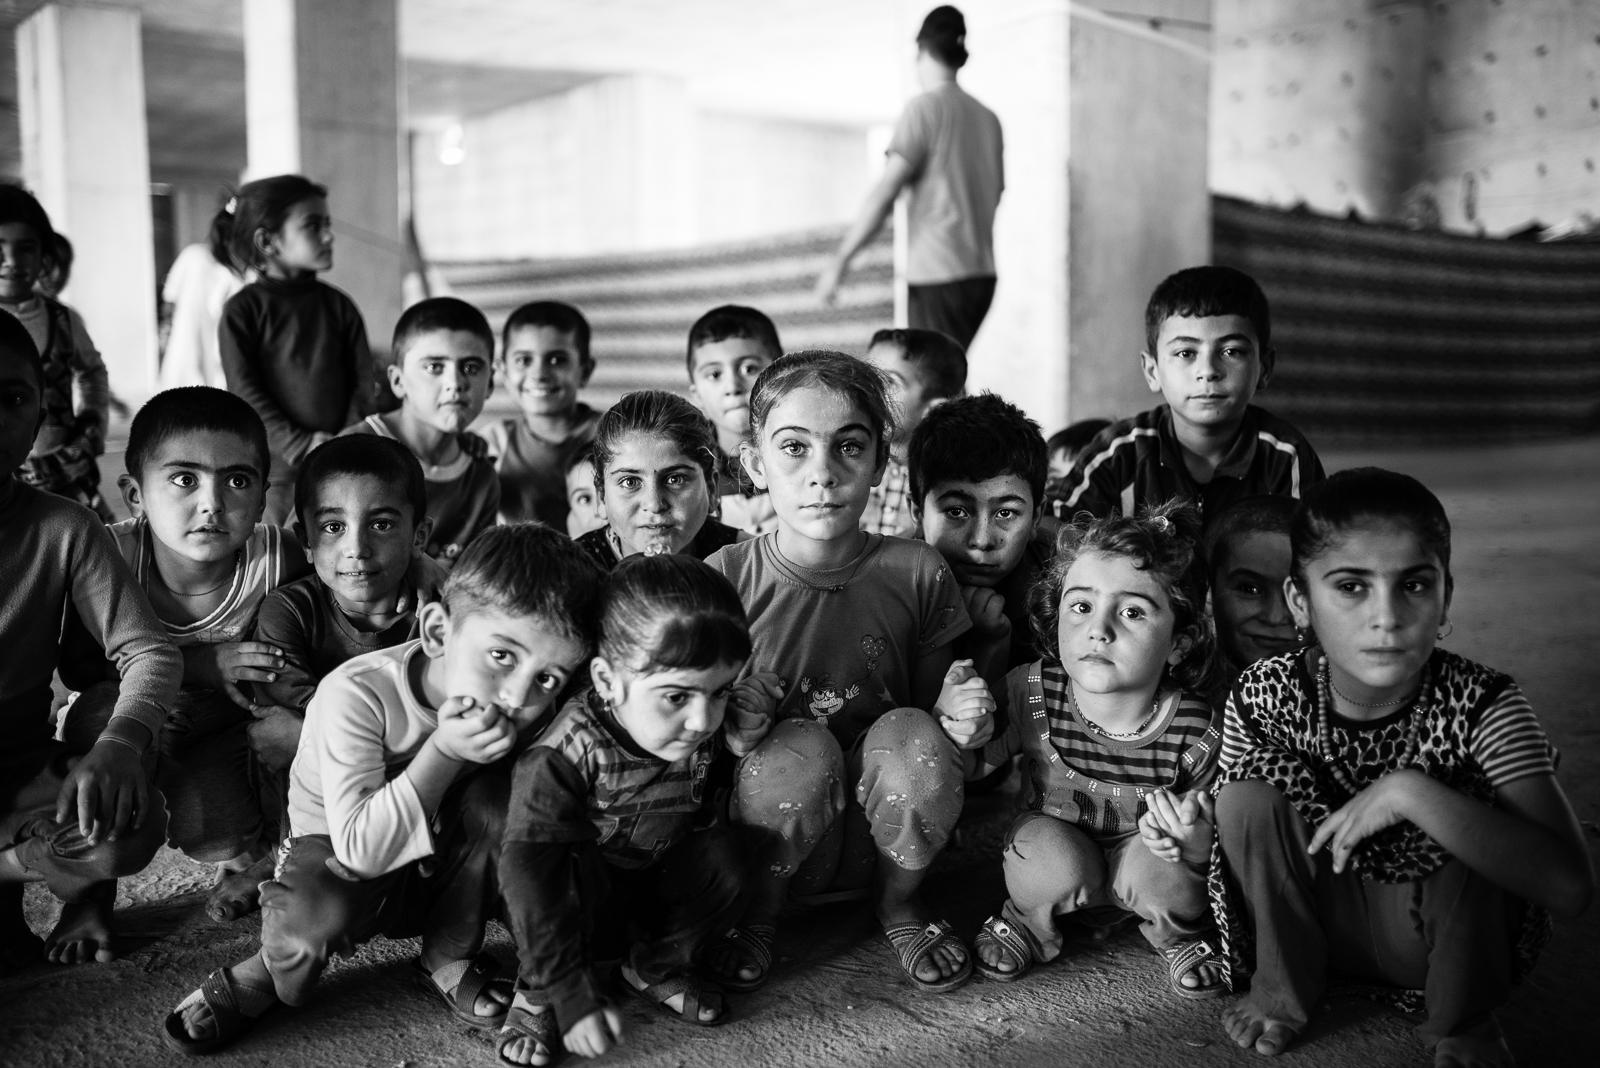 Children inside the Zakho under construction building